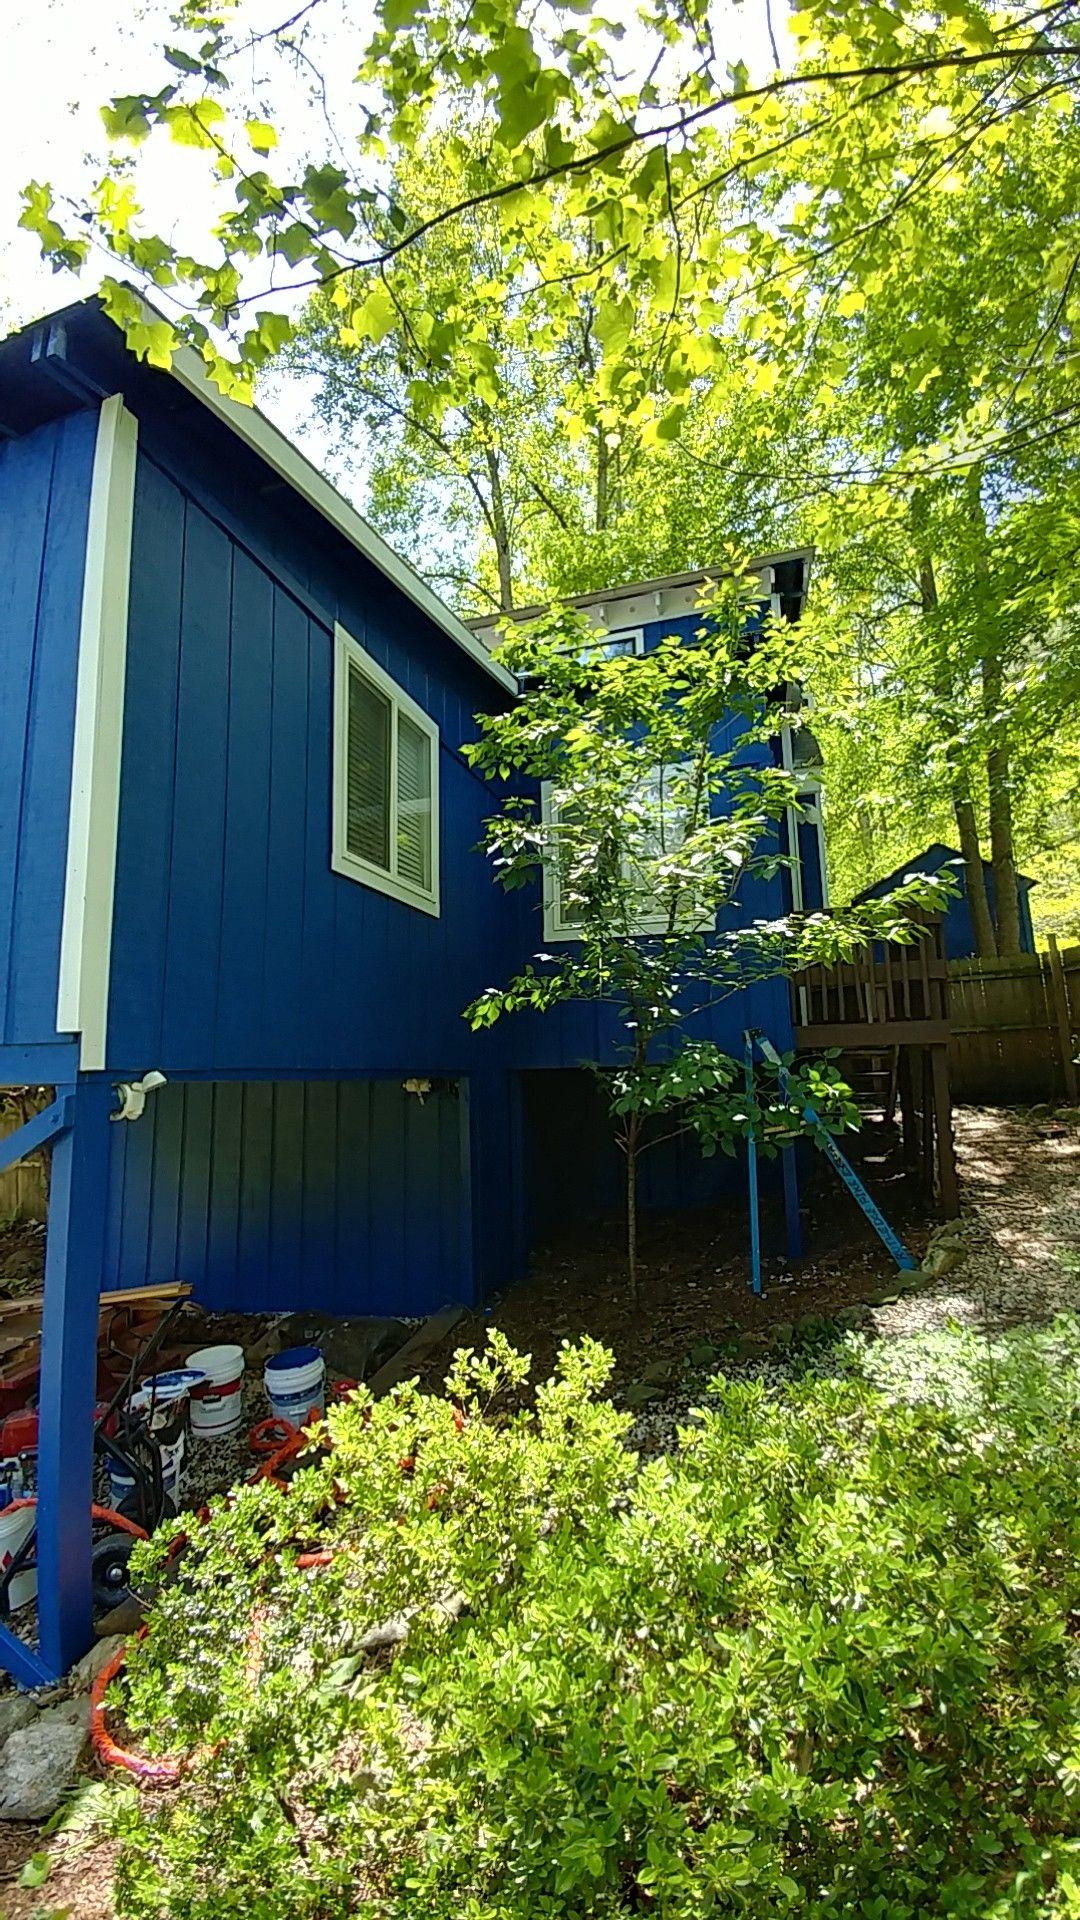 Behr Deck Over in Padre Brown.. Behr door paint in Ruby.. Behr exterior paint in Admiral Blue